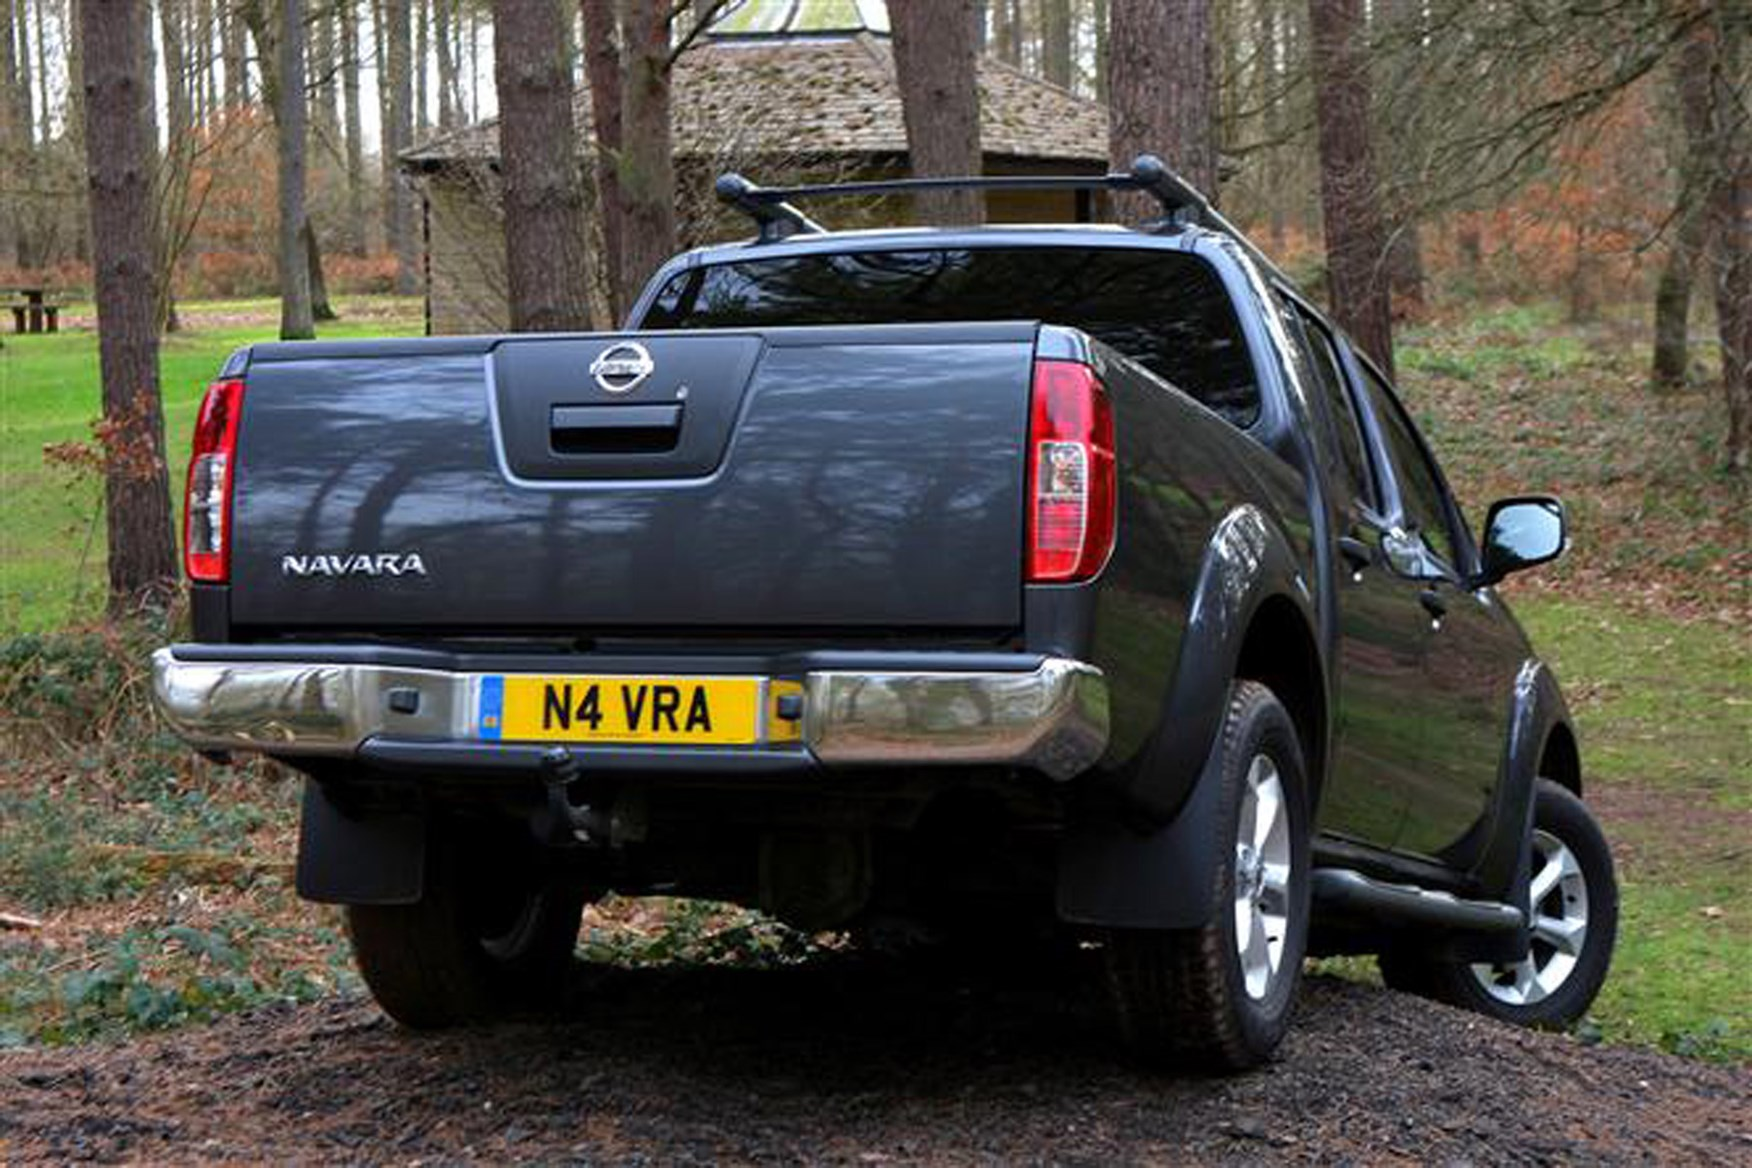 Nissan Navara 2005-2015 review on Parkers Vans - rear exterior